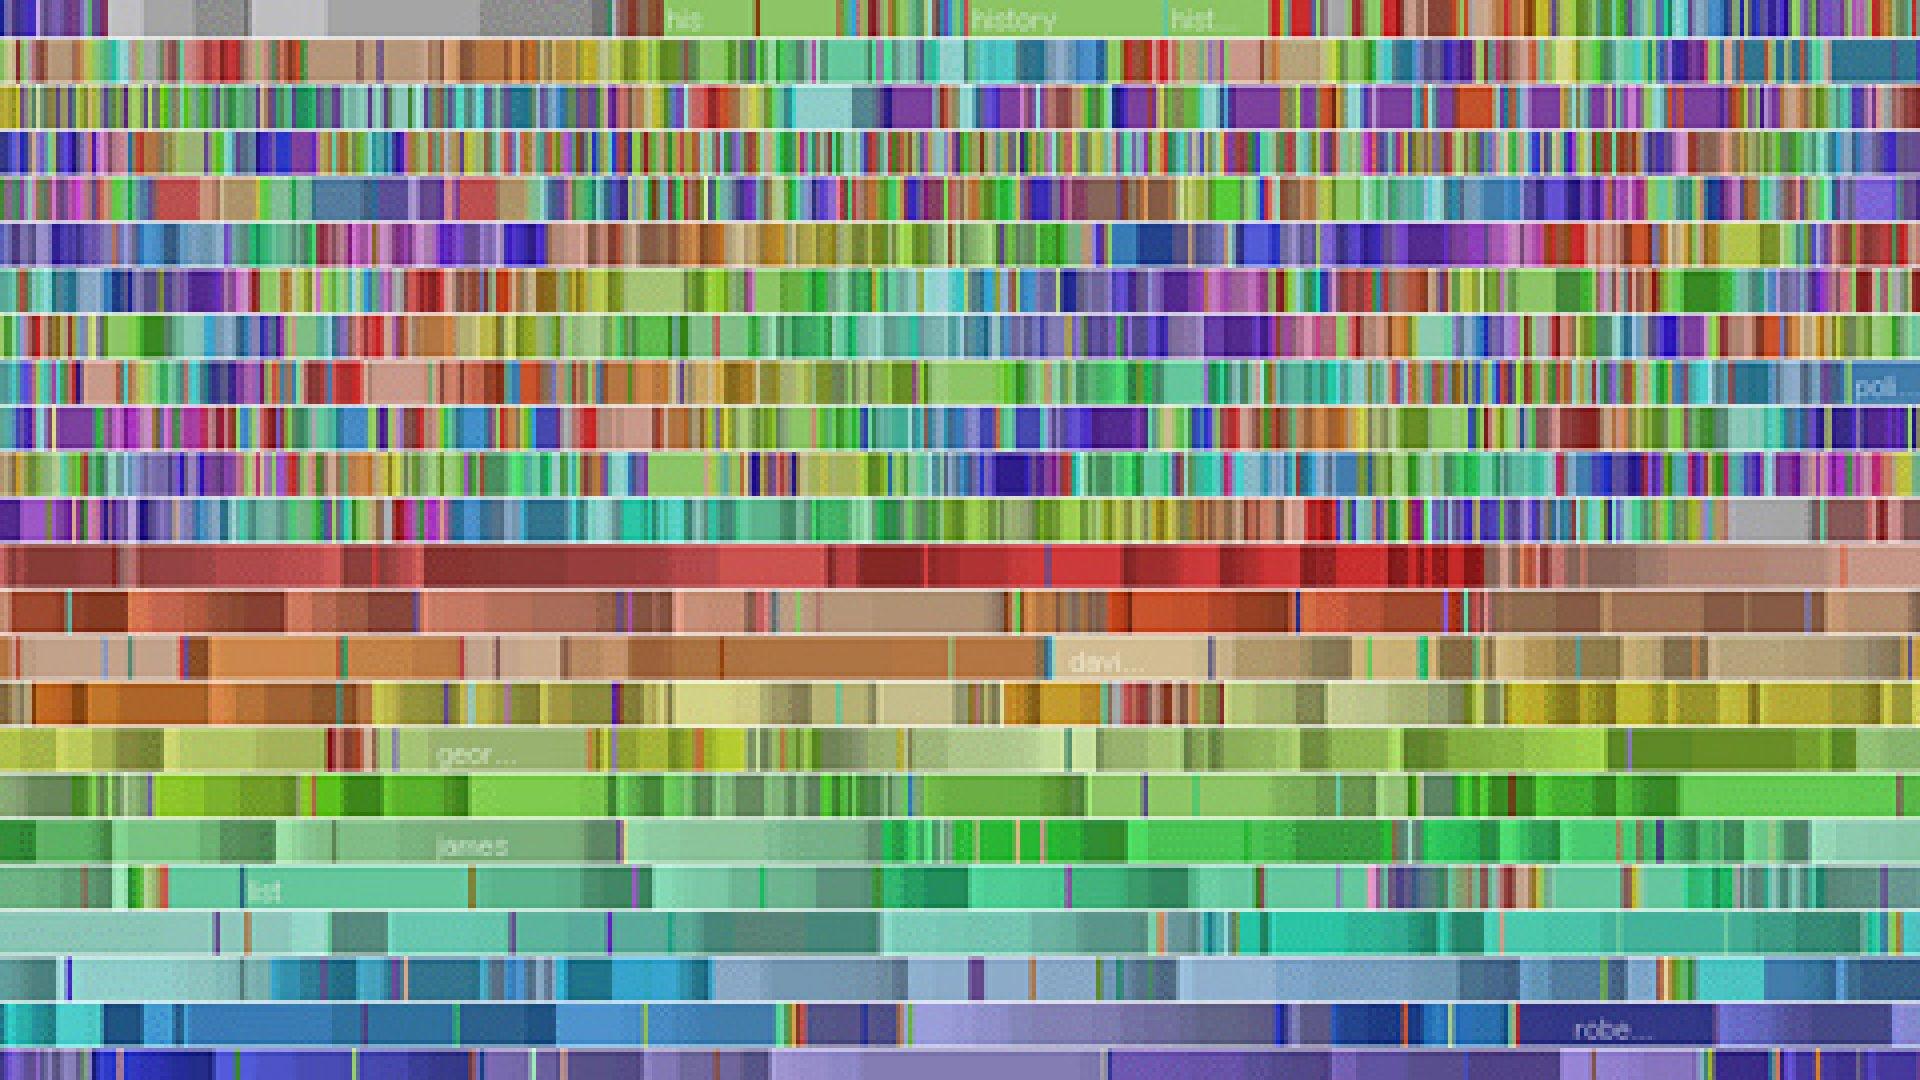 Business Opportunities in Big Data